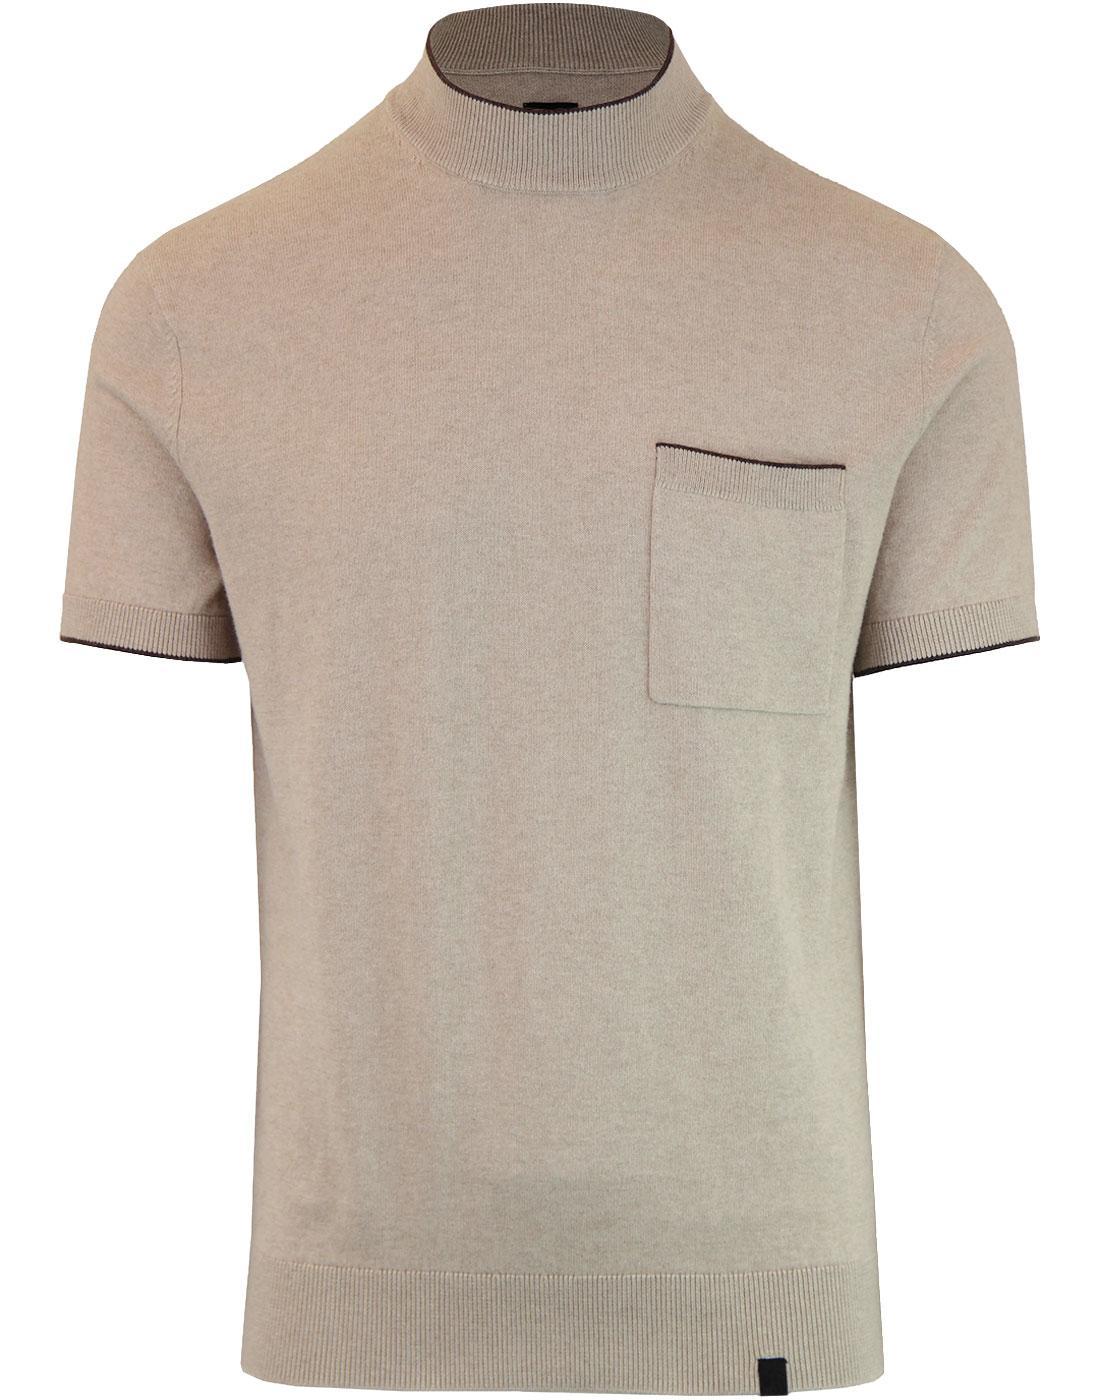 PRETTY GREEN Retro Mod High Neck Knitted T-Shirt